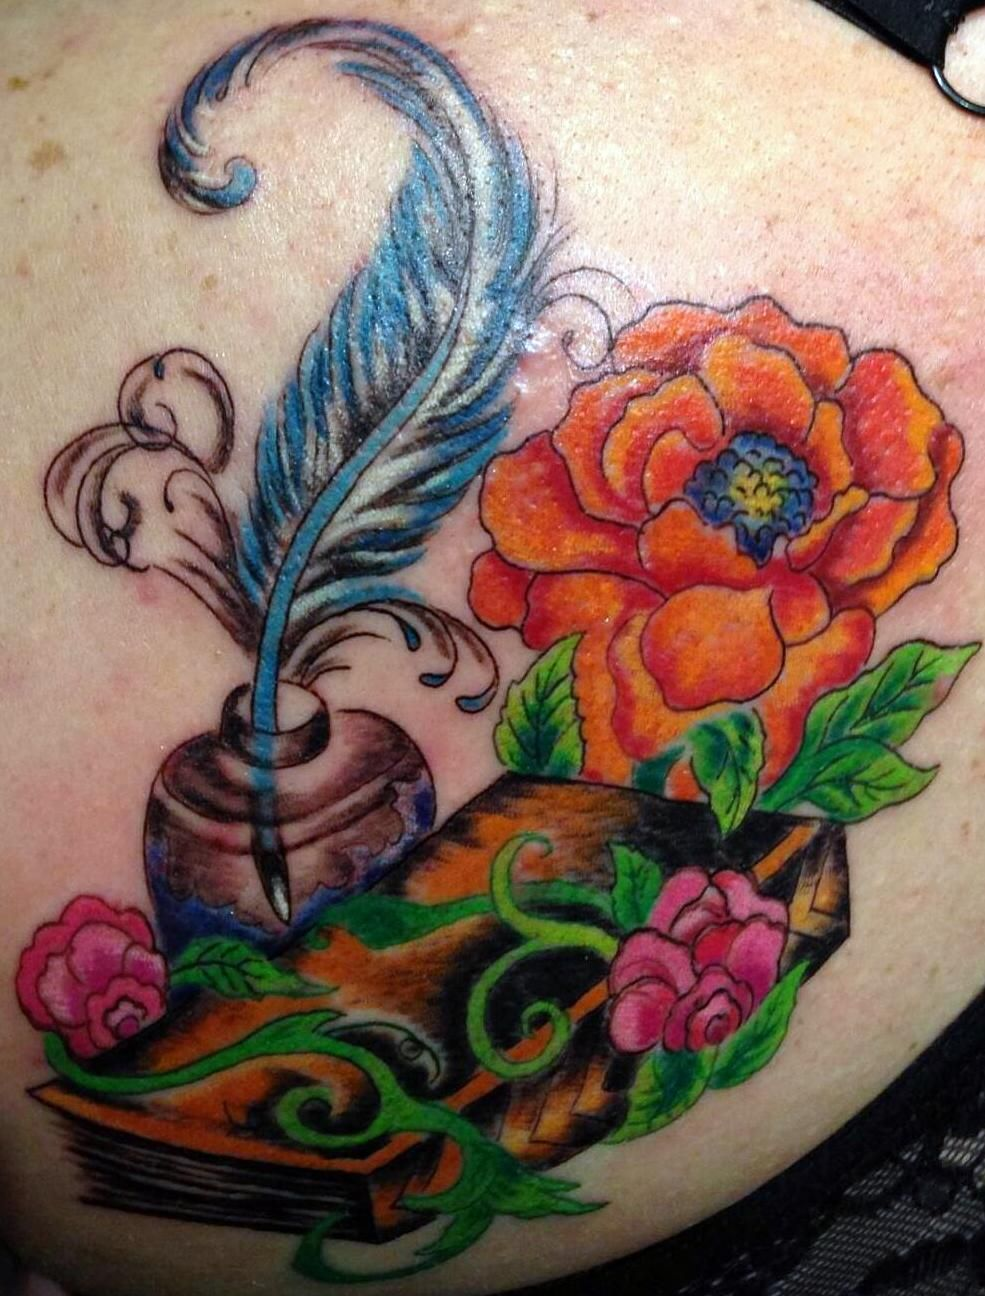 Tattoo, Shoulder Tattoo, Peony, Peony Tattoo, Book, Book Tattoo, Quiil and Book, Orange Peony, Sweet Pea Tattoo, Dreamscape Tattoo Shop